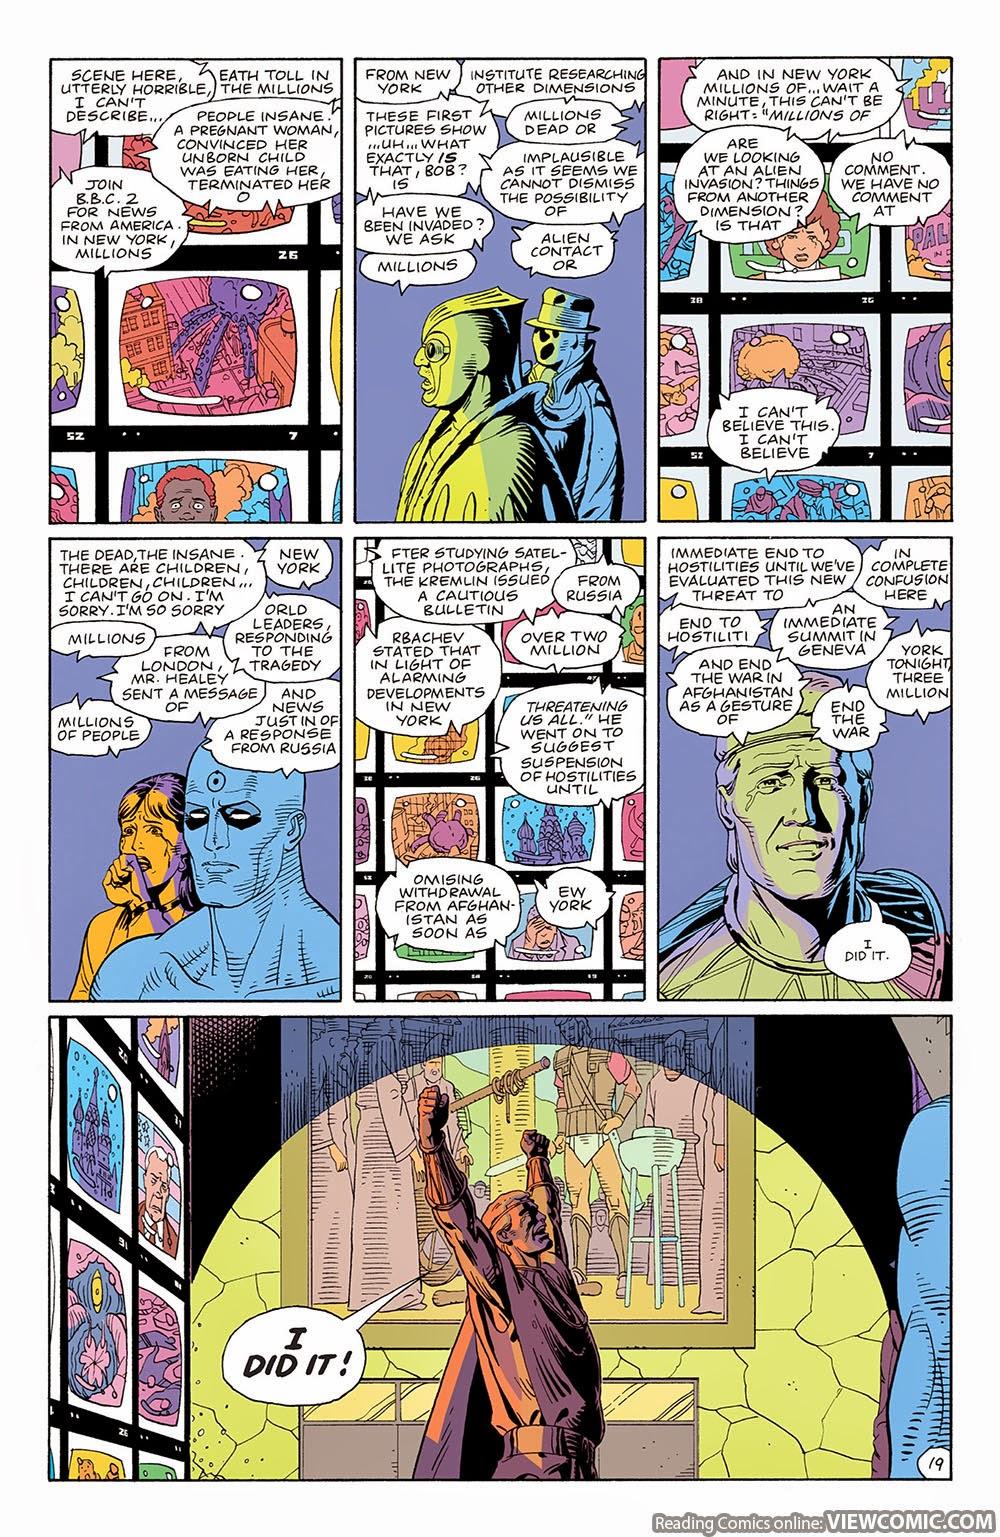 💐 Free comic book app | The 5 Best Free Comic Book Reader